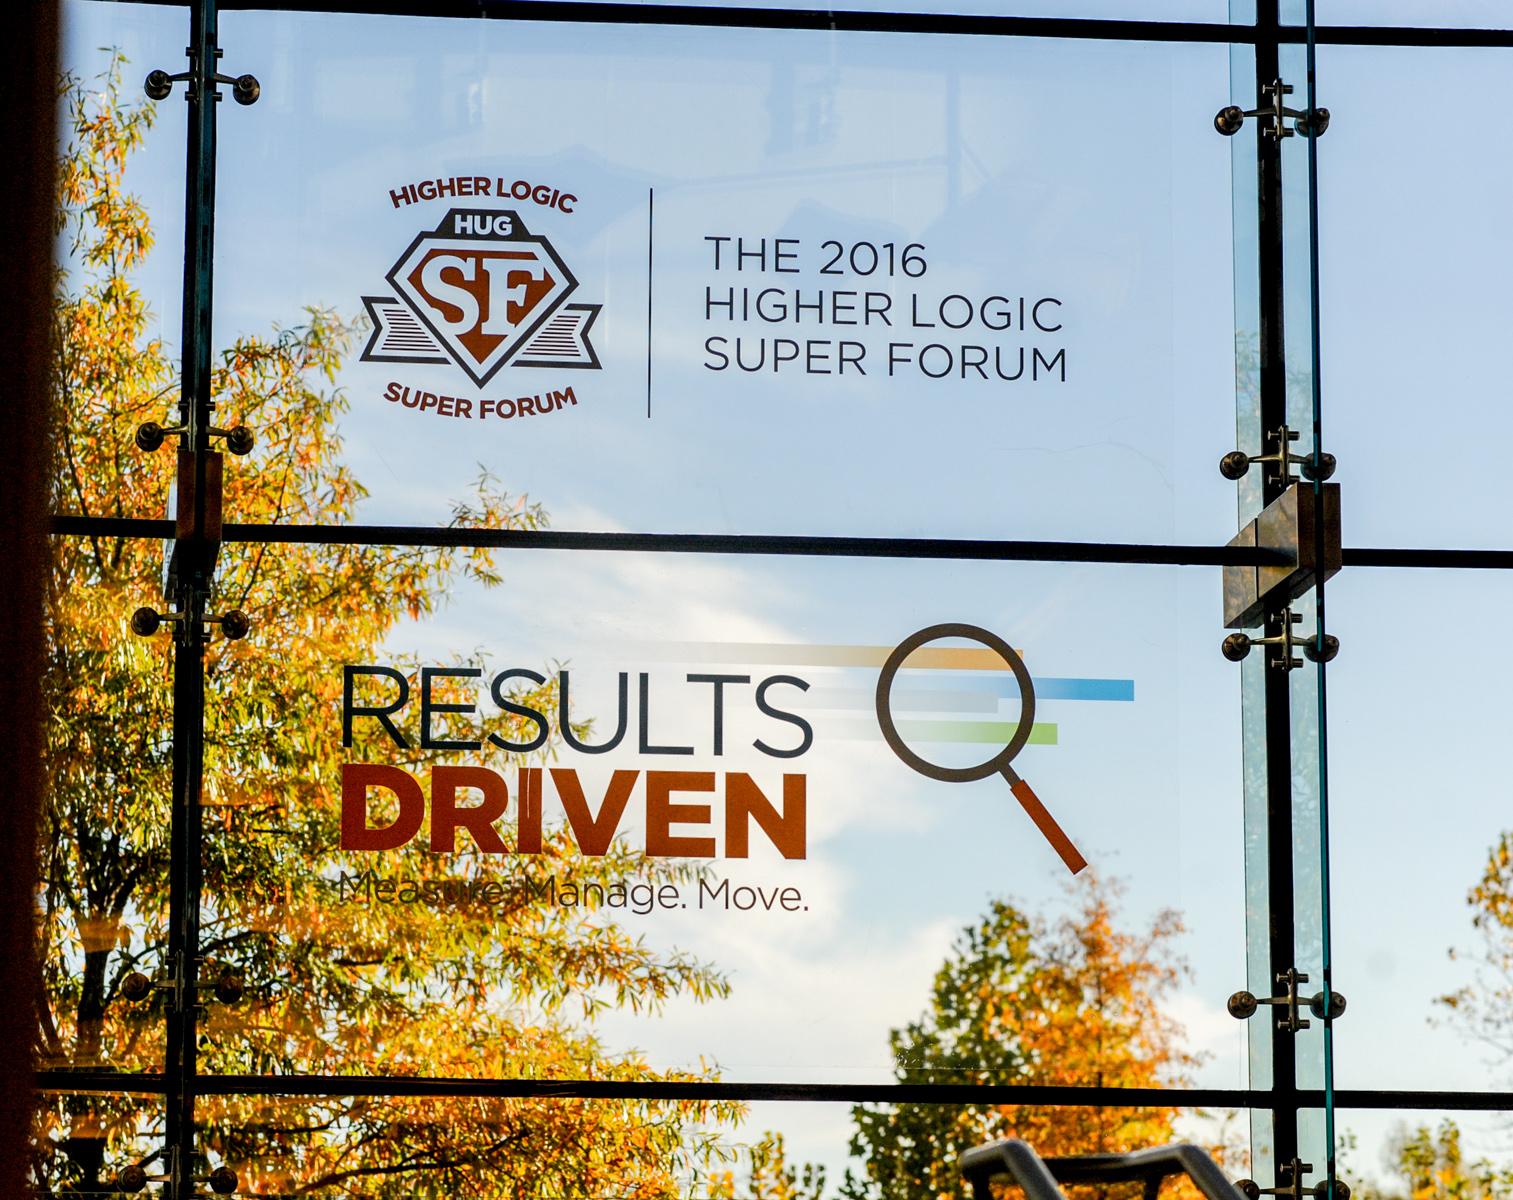 2016 Higher Logic Super Forum - Results Driven